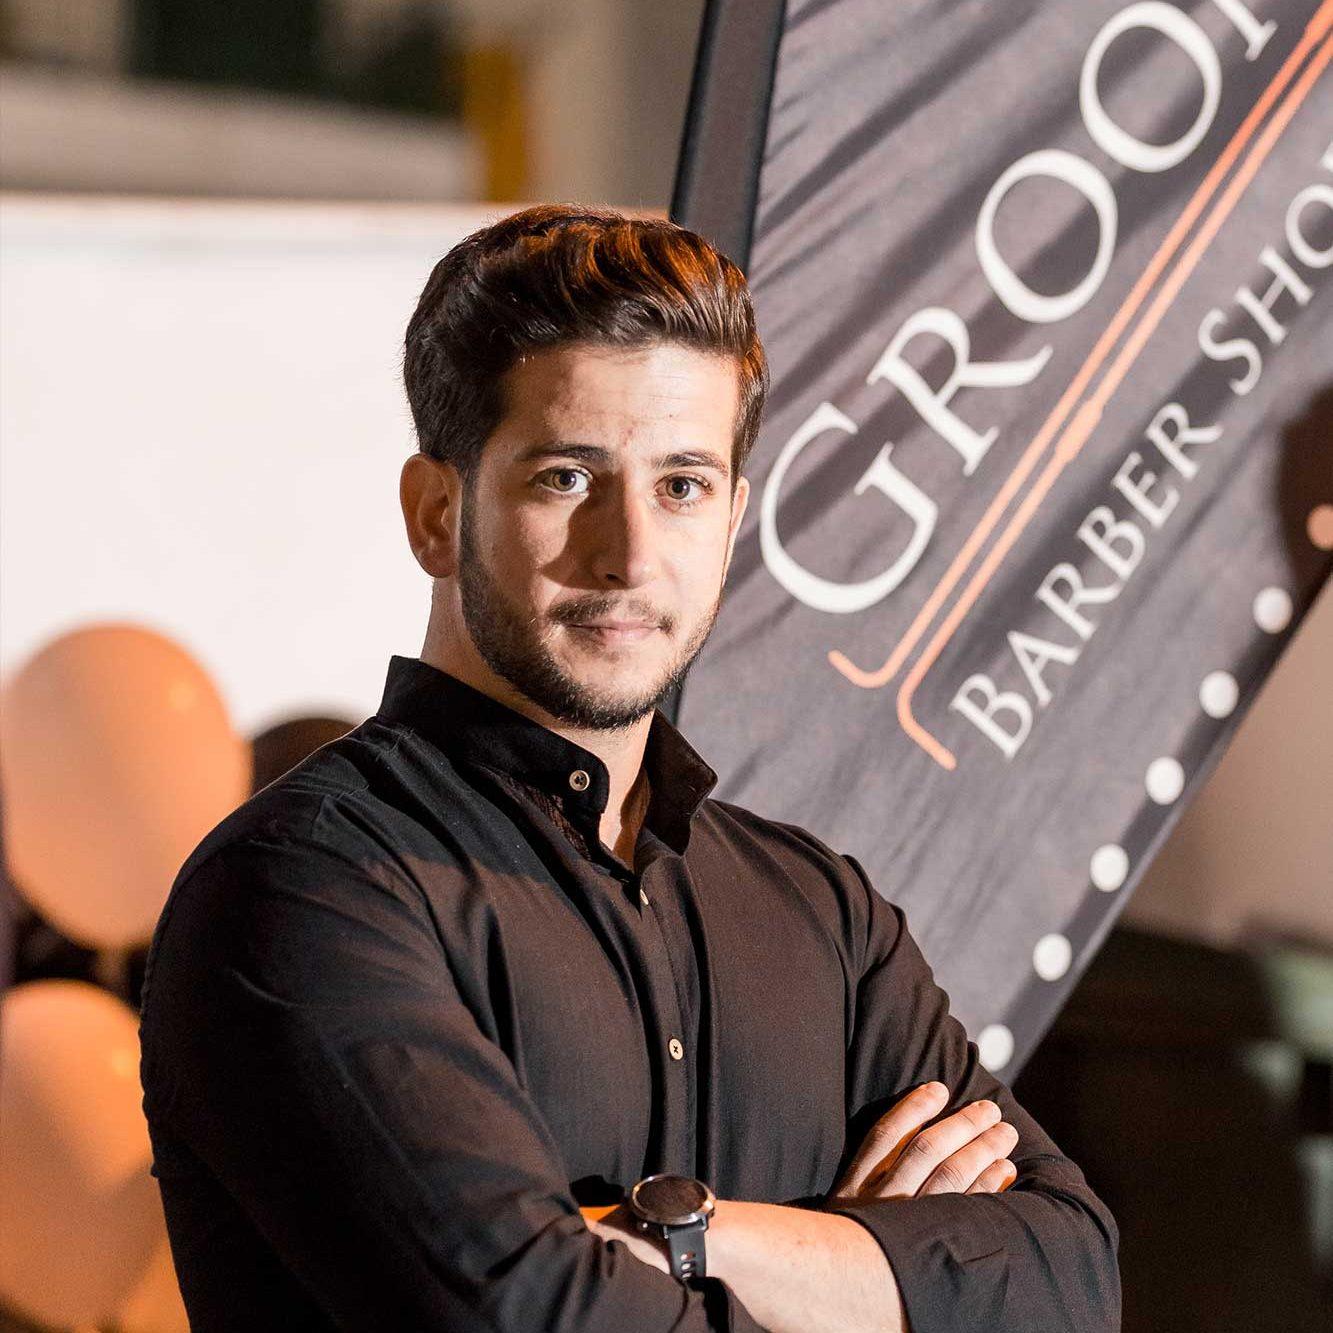 01a-team-photo-groomers-barber-shop-karlovassi-samos-markou-graphdays